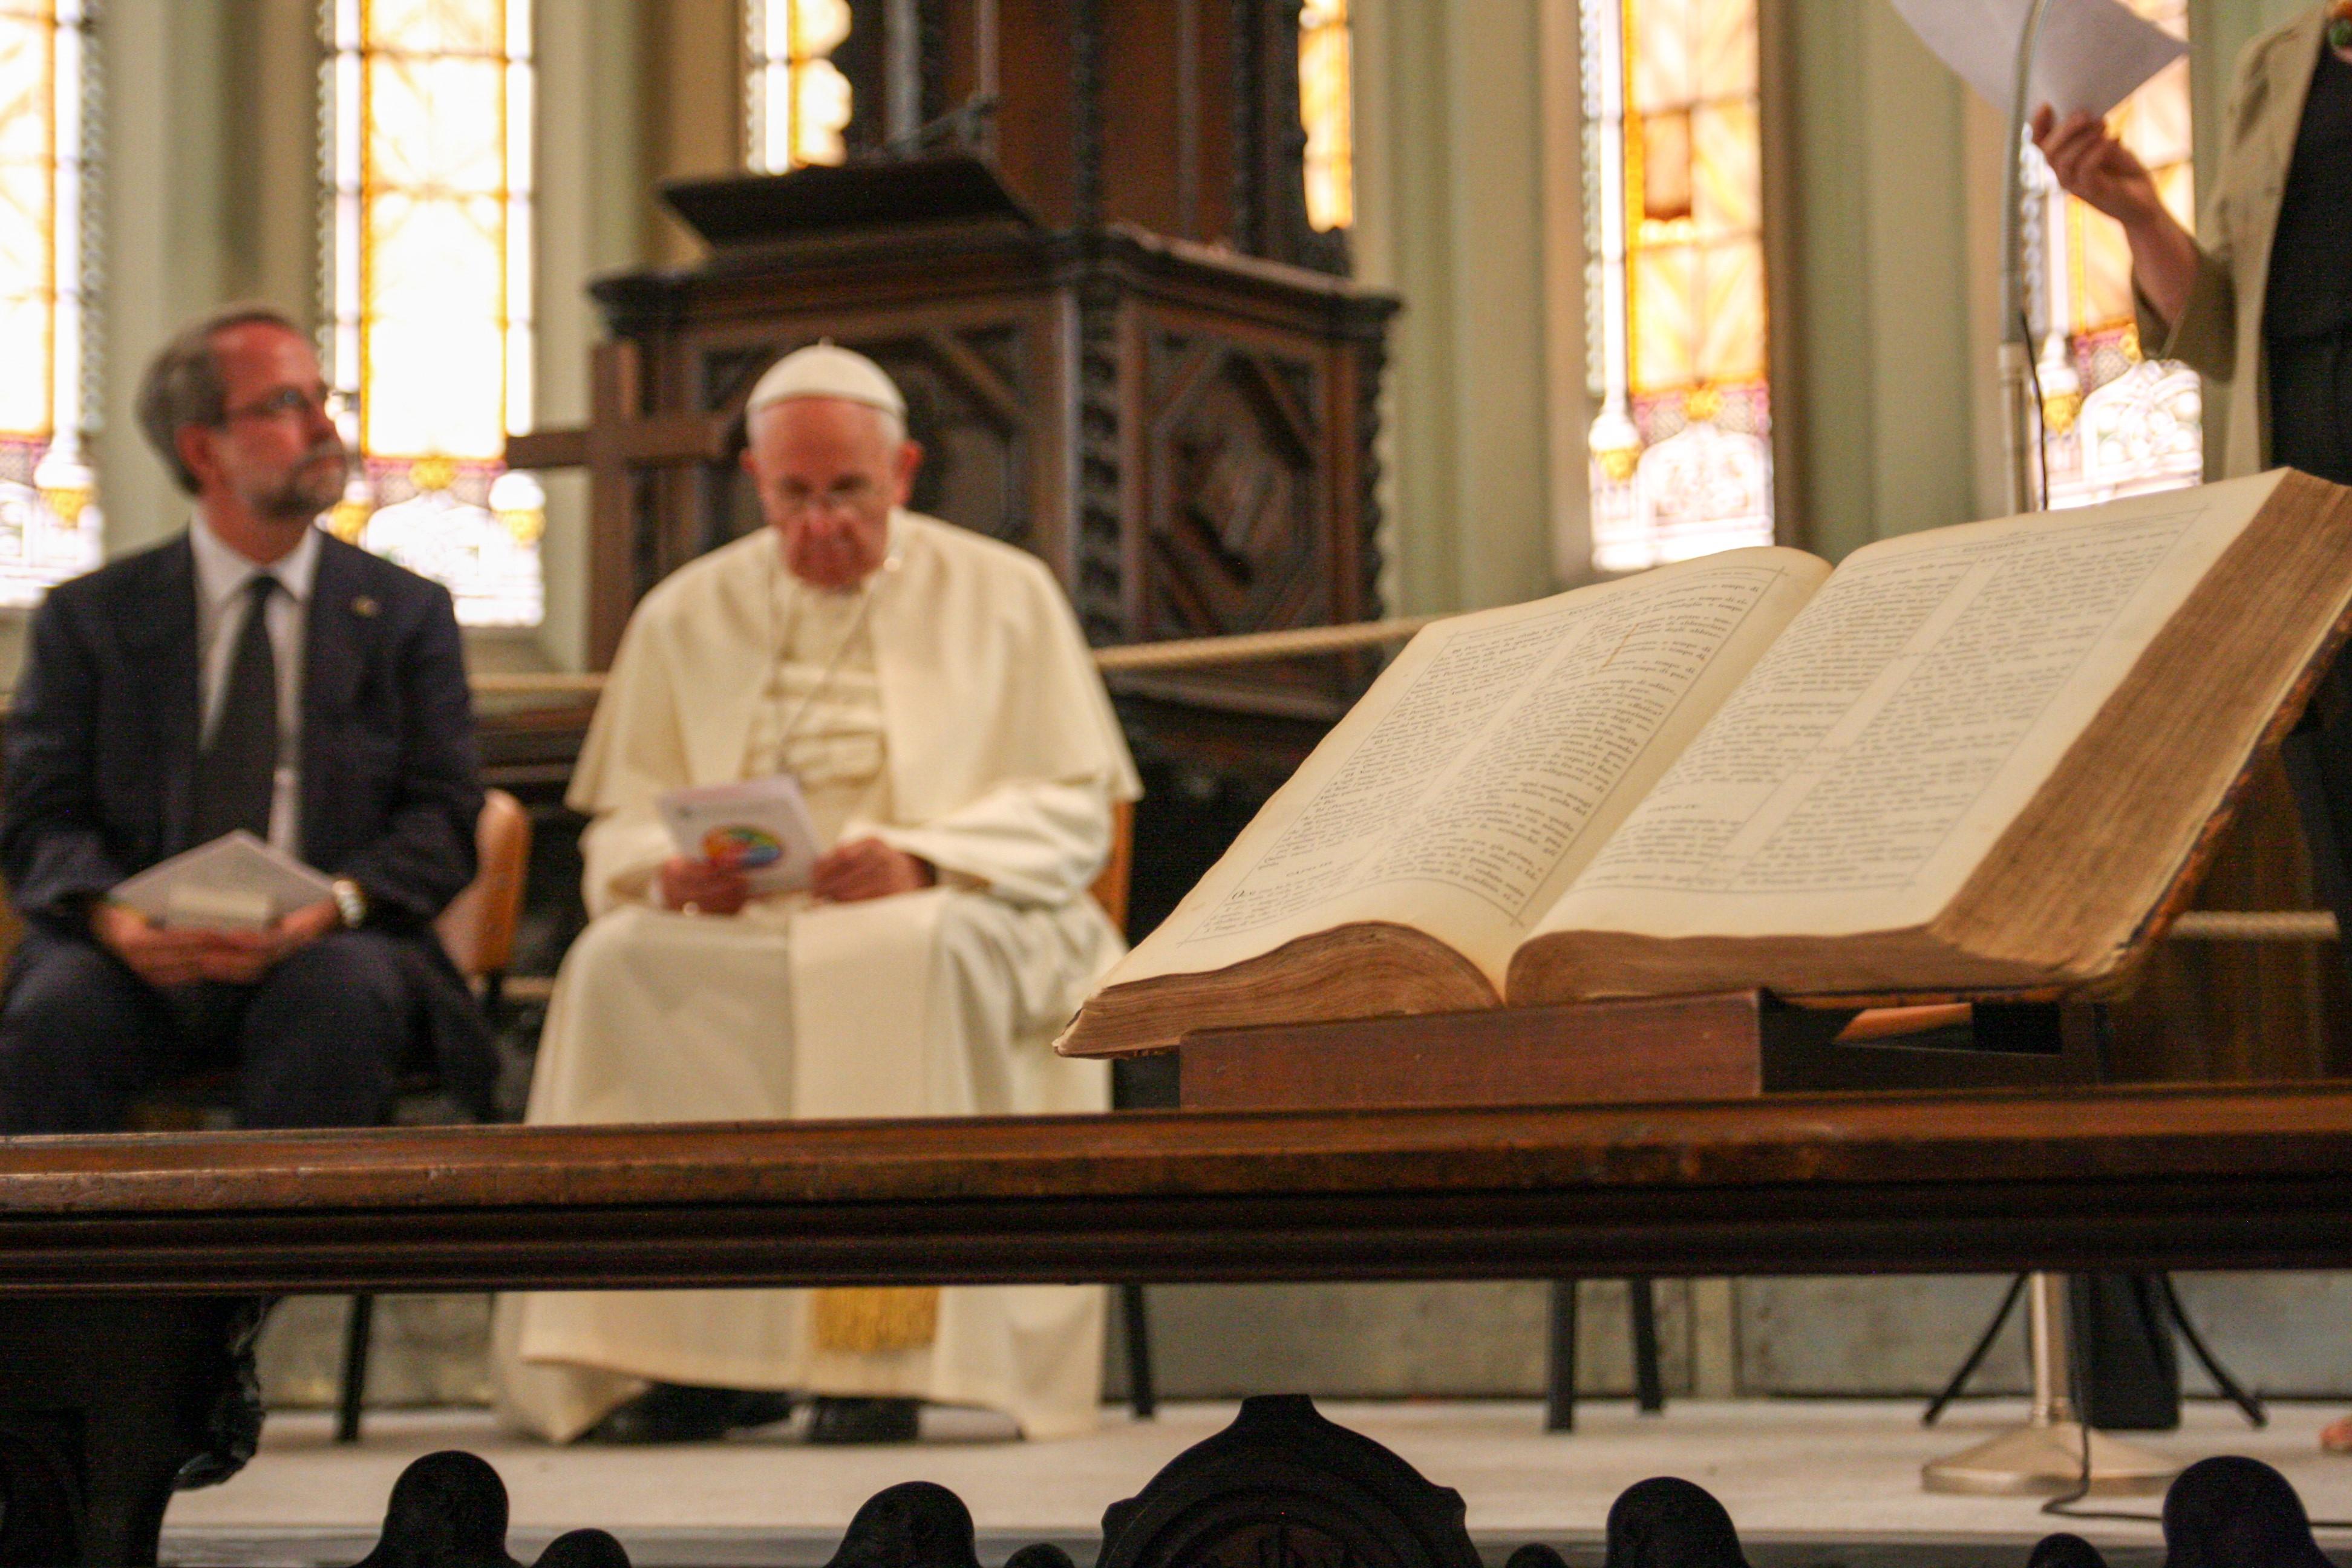 Visite du pape au temple vaudois de Turin (le 22 juin 2015) © Riforma/Pietro Romeo